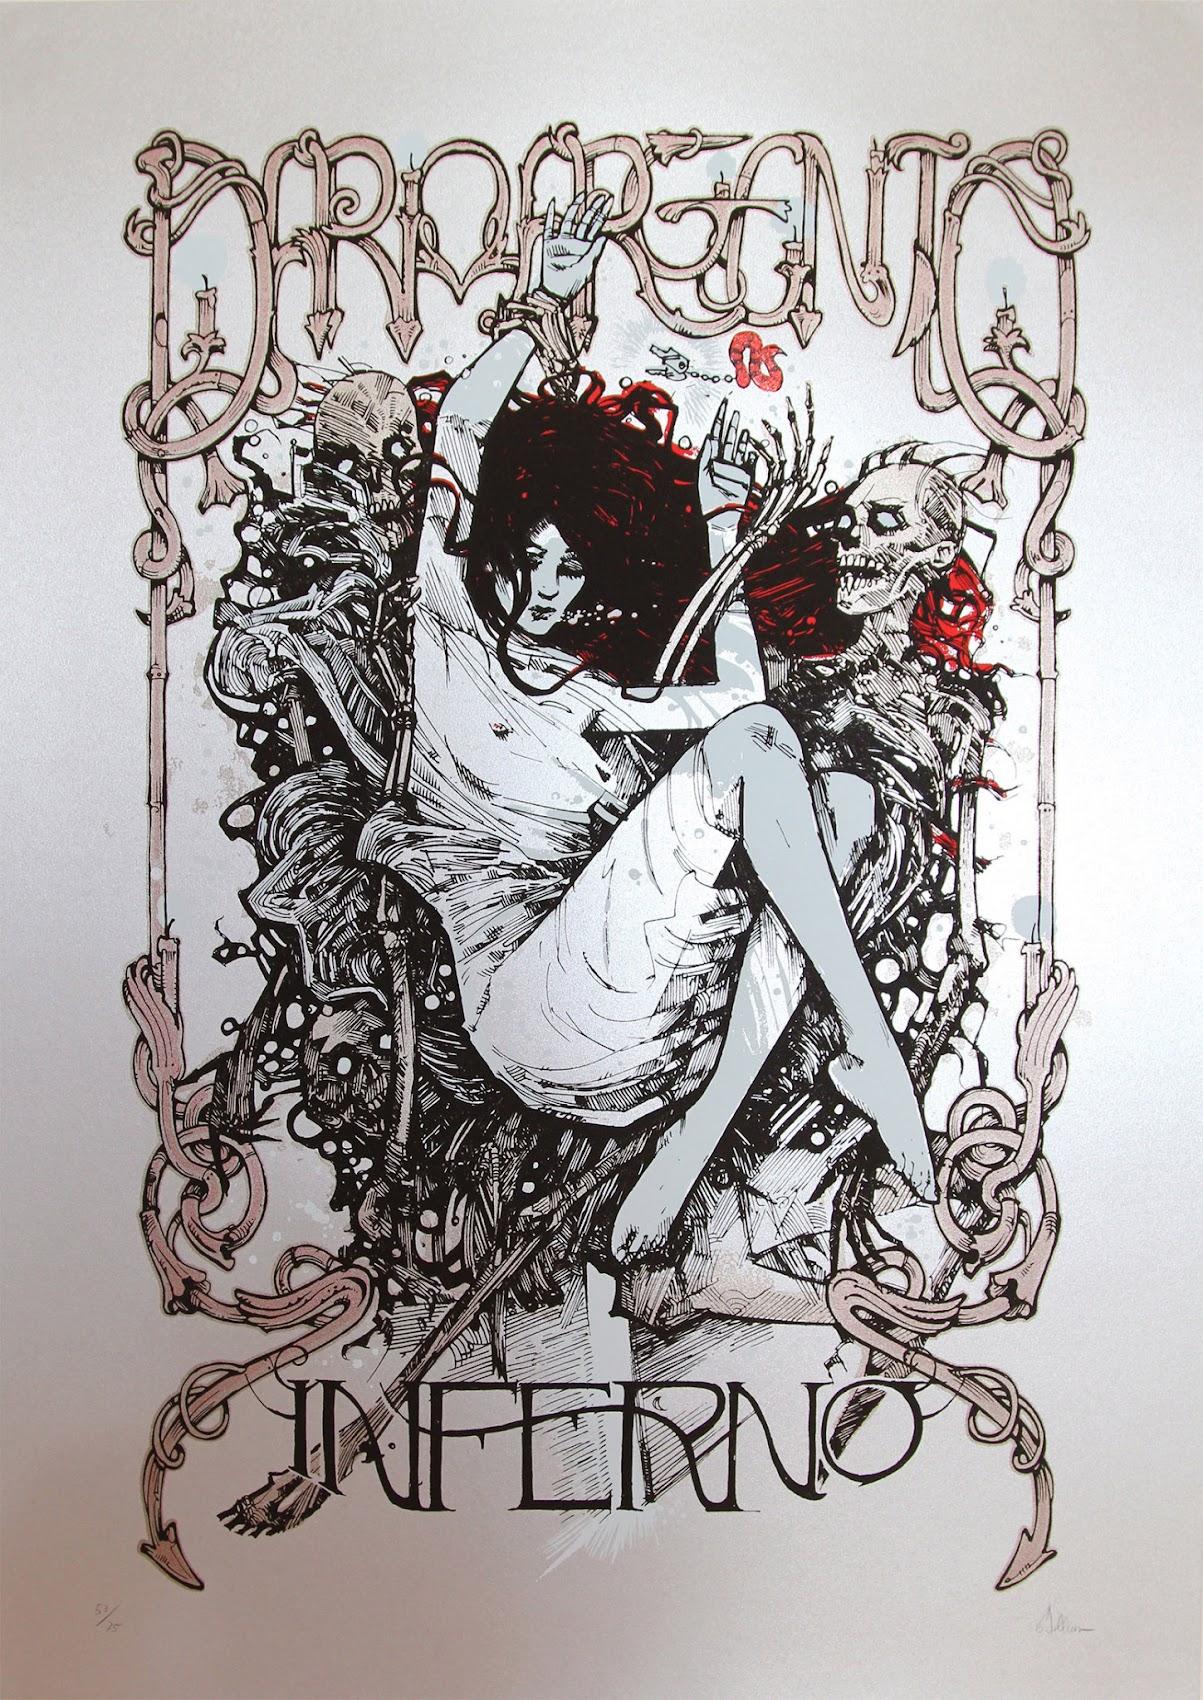 http://4.bp.blogspot.com/-7sGvyTOToyY/UOpvPCivwaI/AAAAAAAAvB0/t7Cde5rA_ws/s1700/Inferno-Variant-Malleus-movie-inside-the-rock-poster-frame.jpg